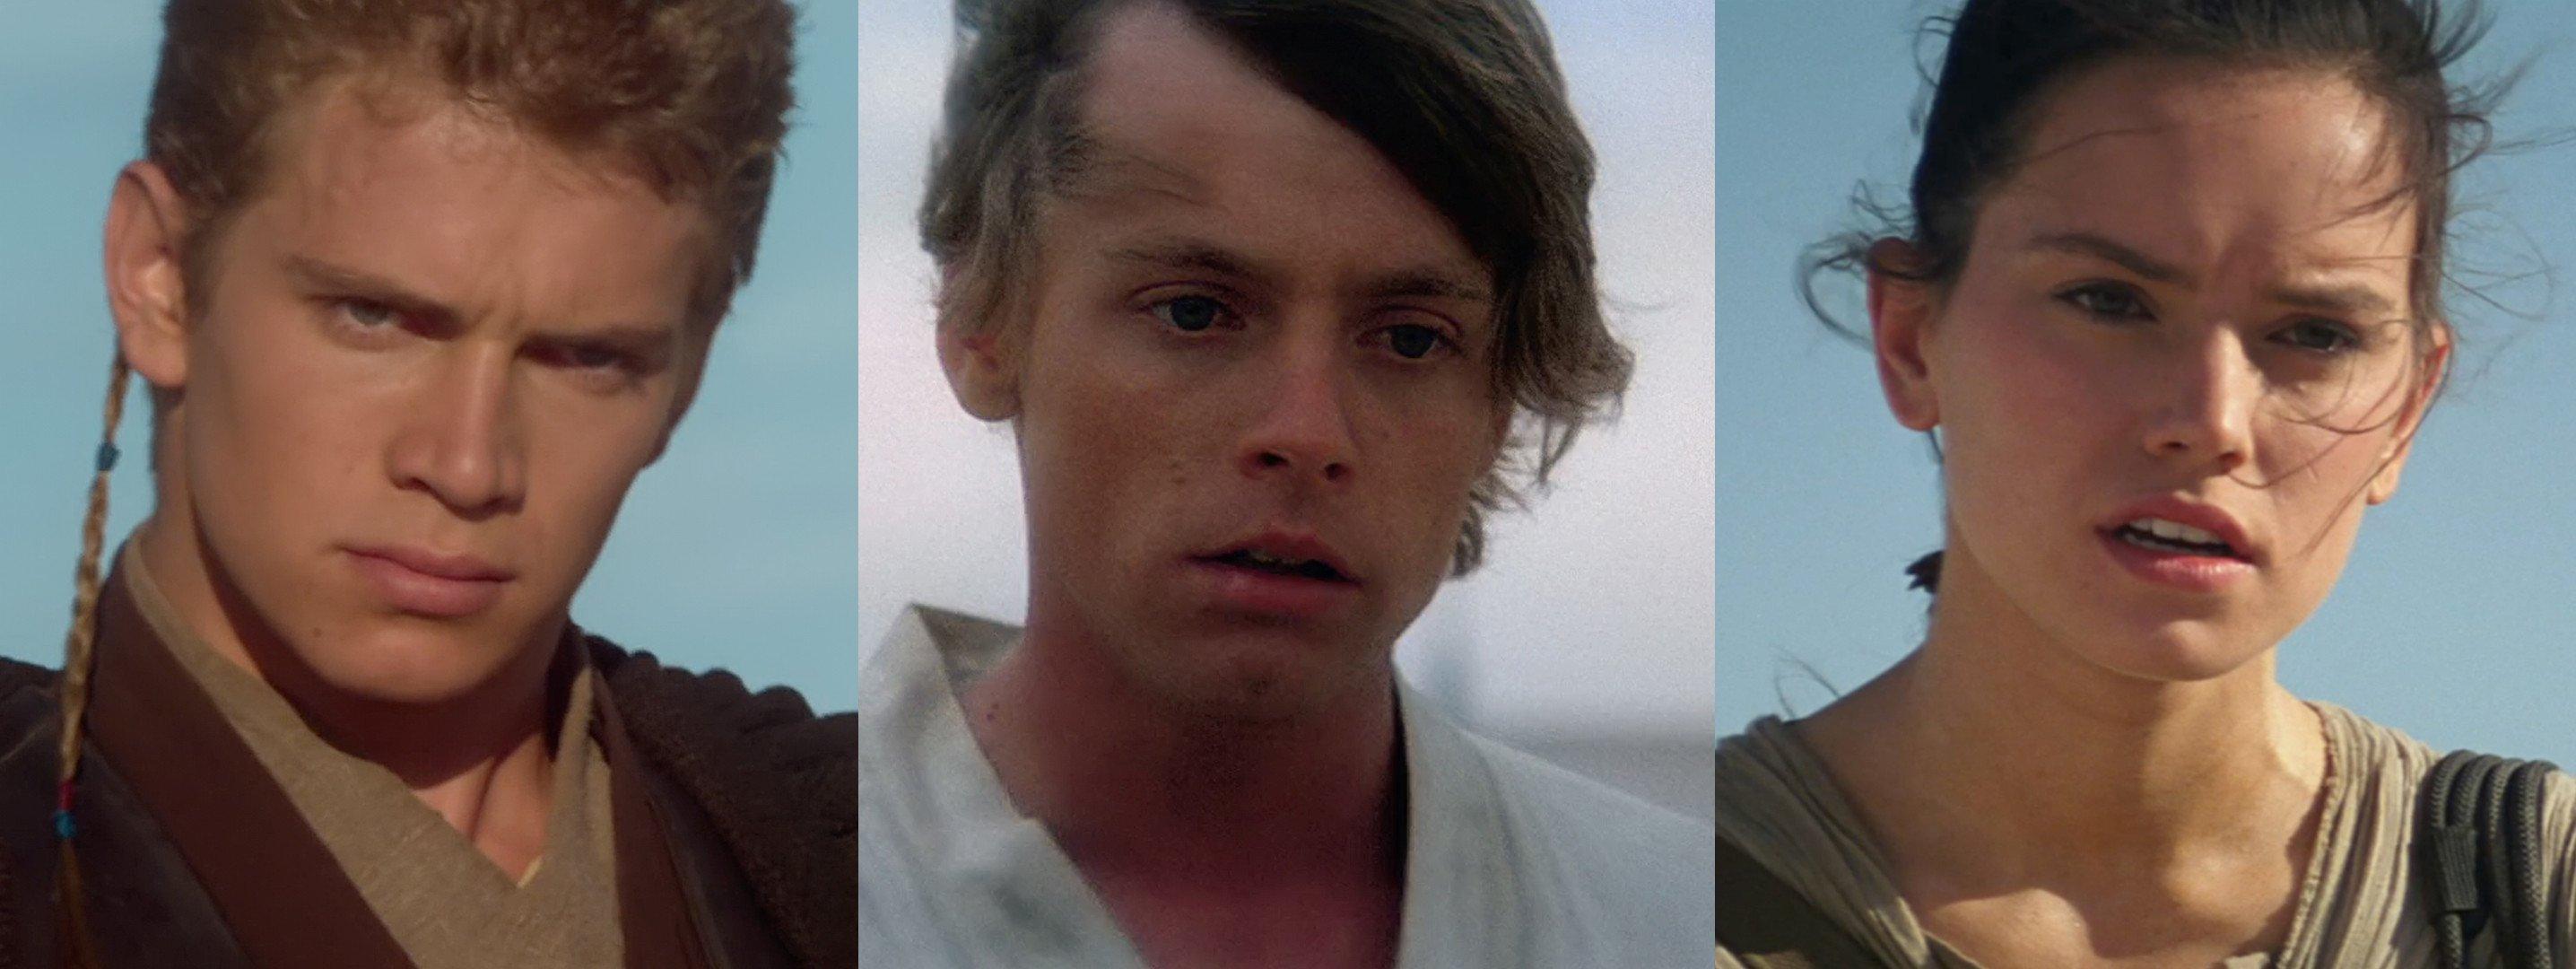 Skywalker Generations